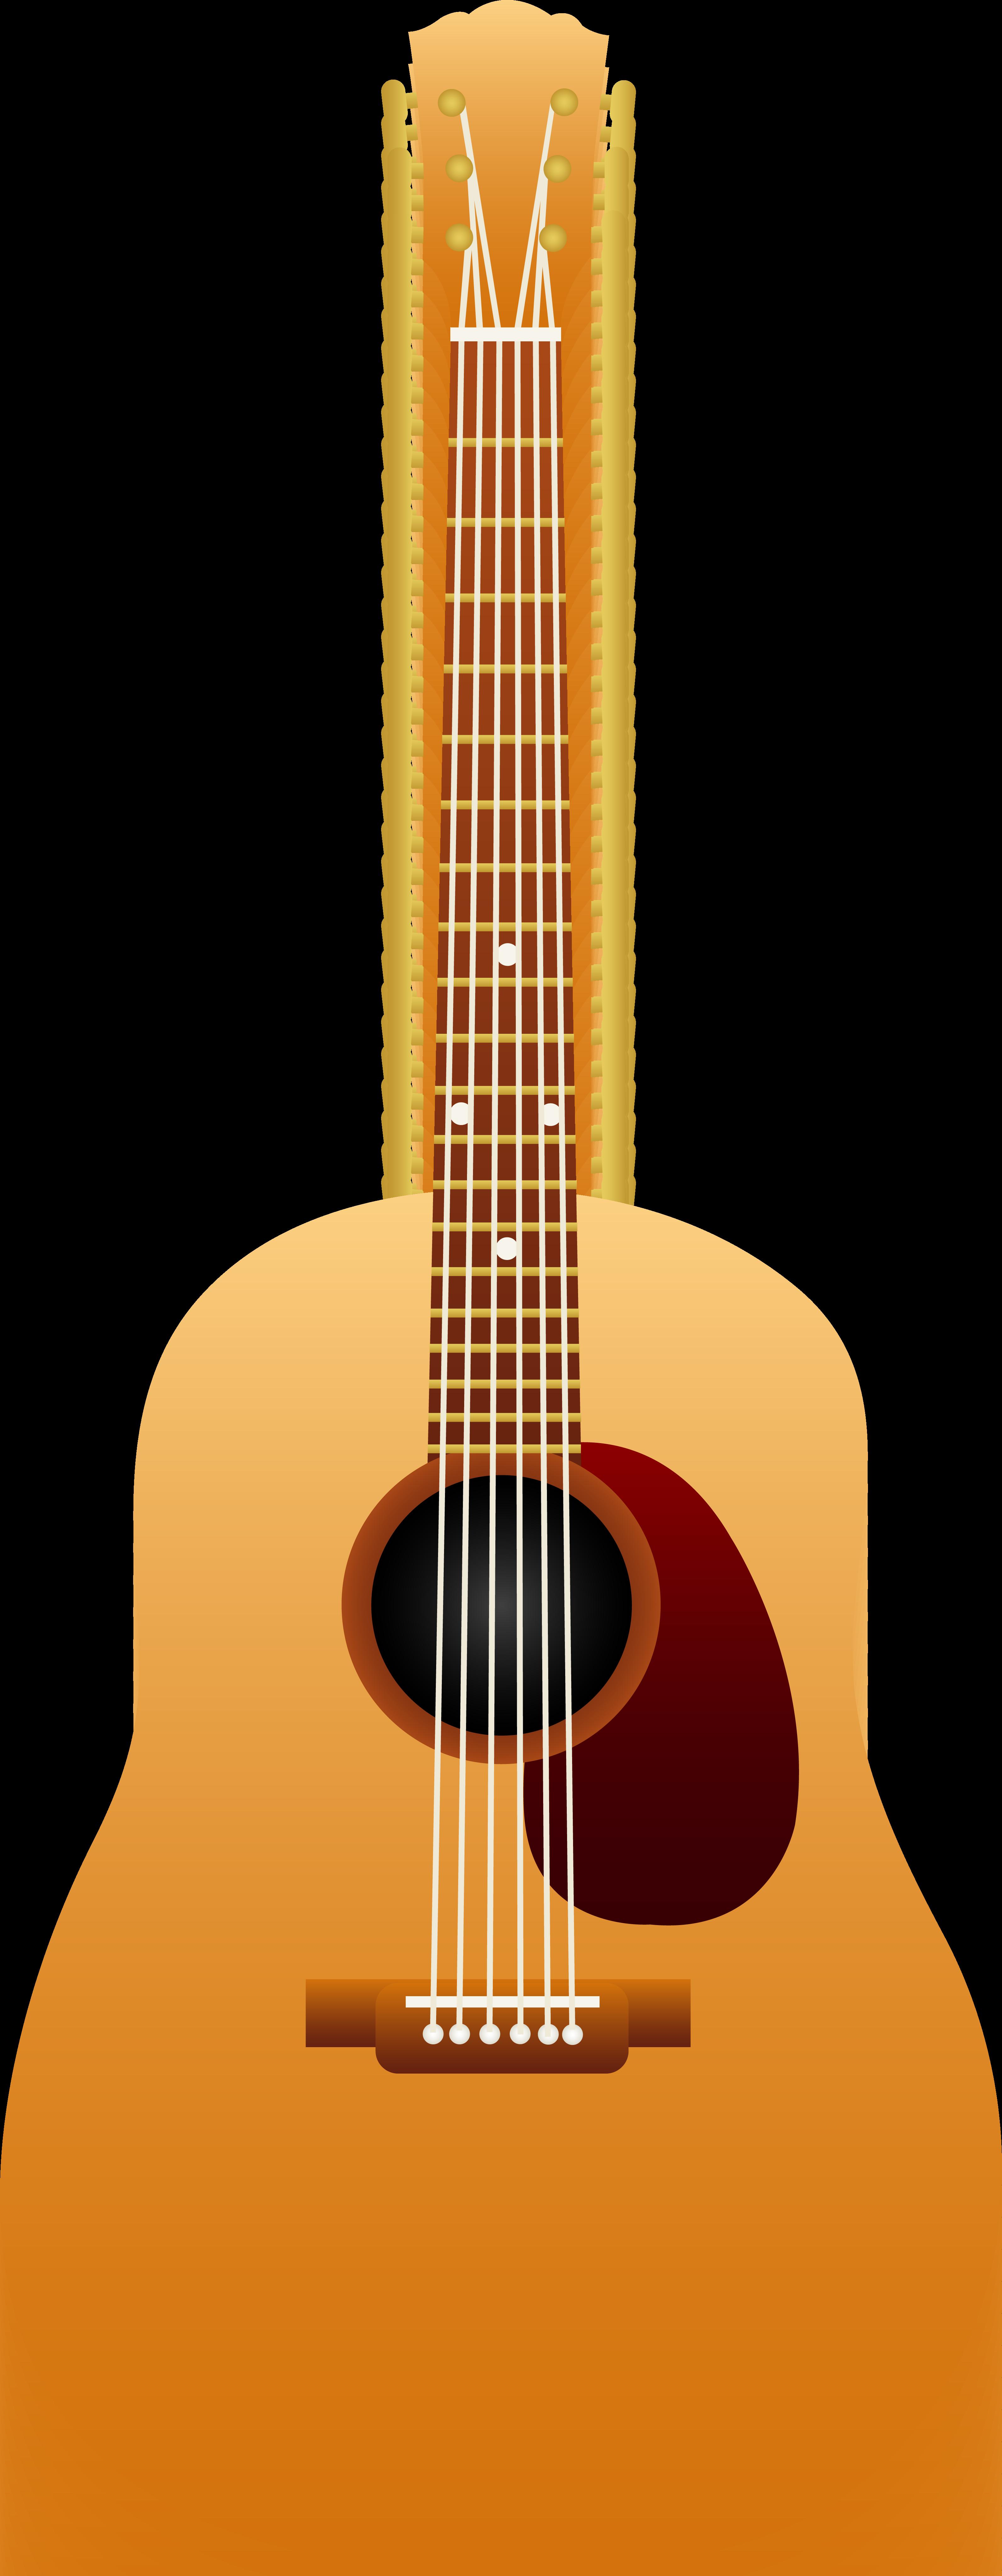 Clip art royalty free. Clipart guitar box